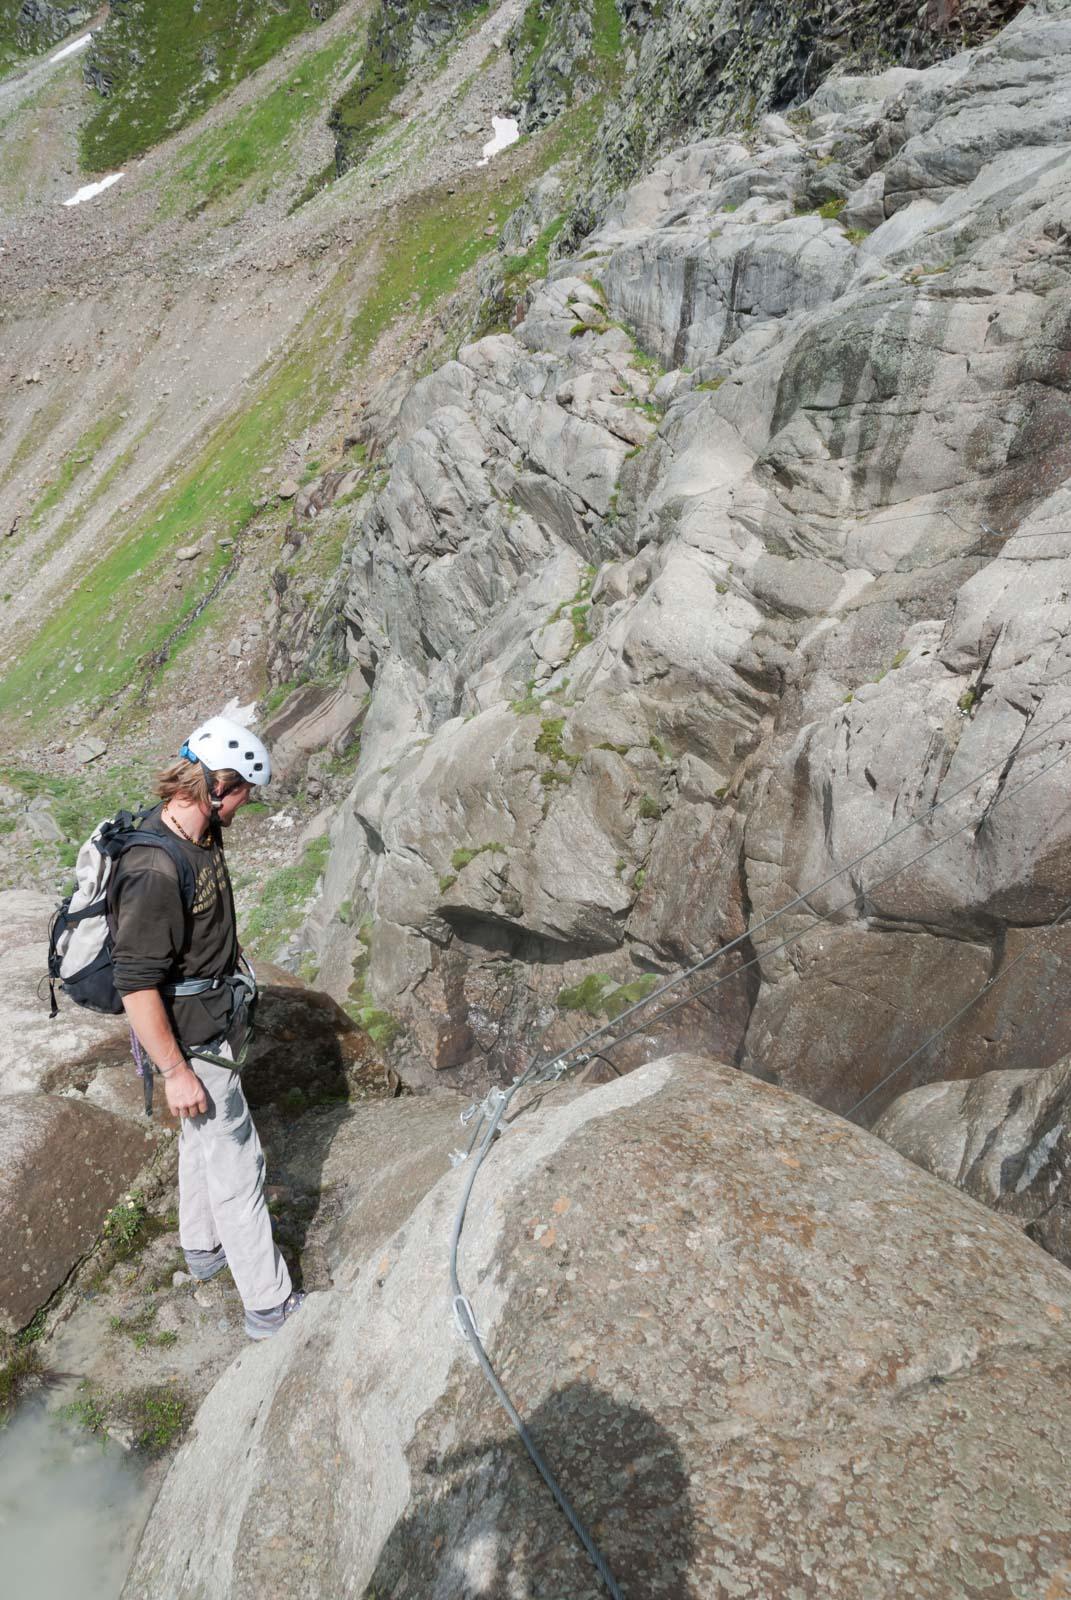 Pitztaler Steinbock Klettersteig Seilbrücke Wasserfall